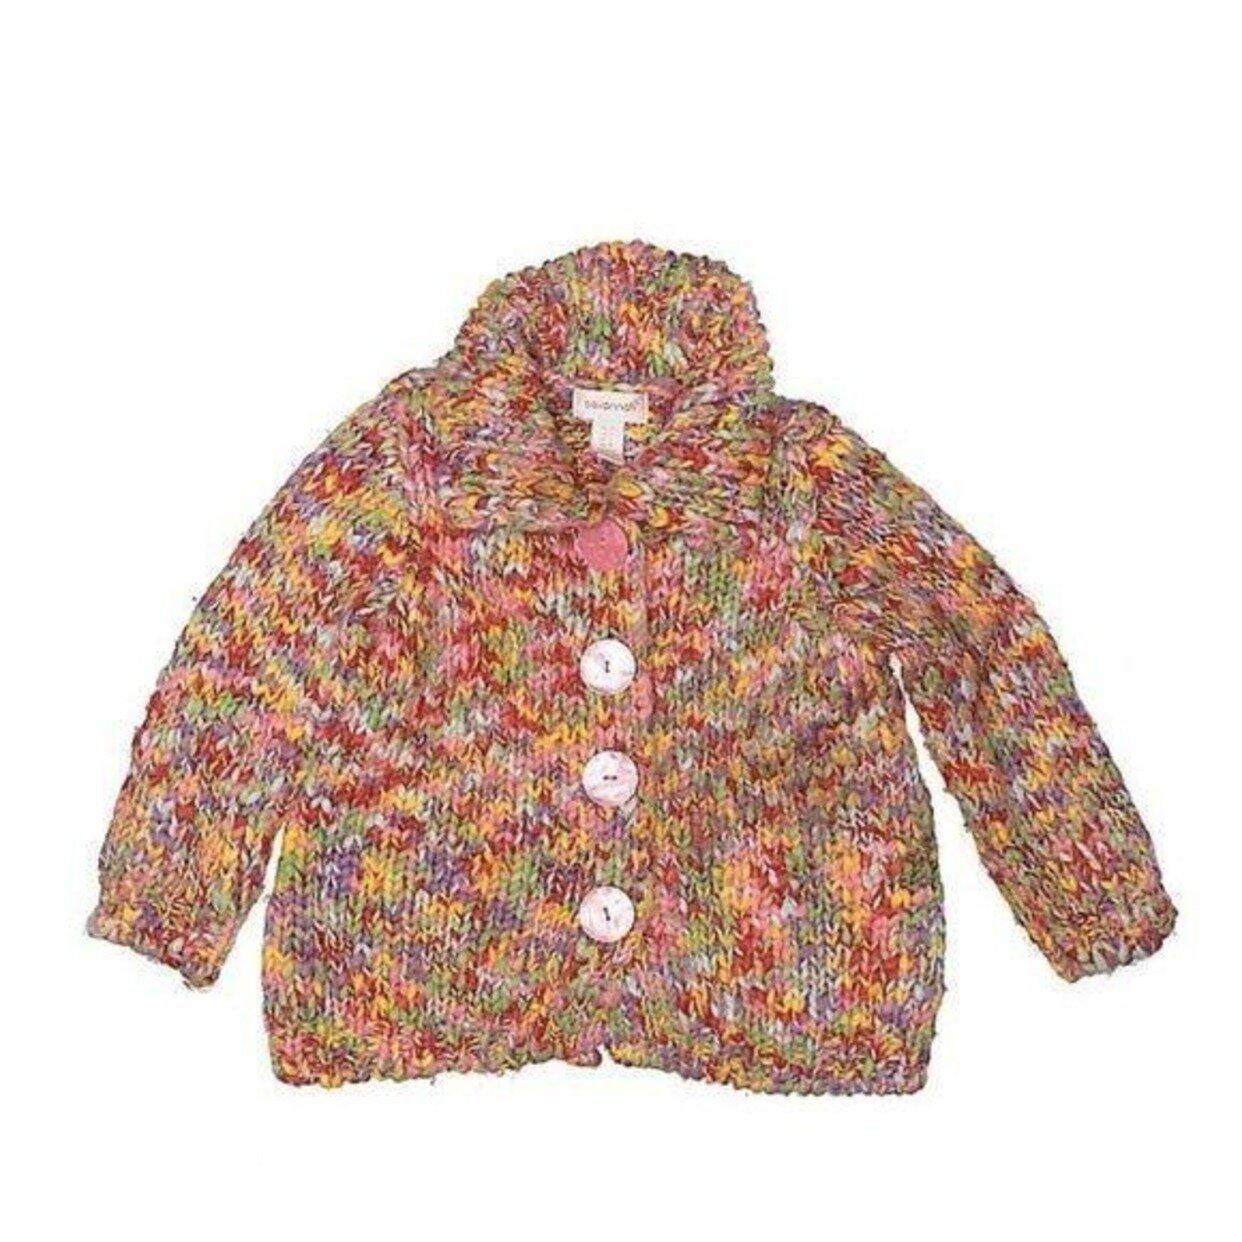 Kollyy Women Pants Casual Multicolor Wool/knitting Pants